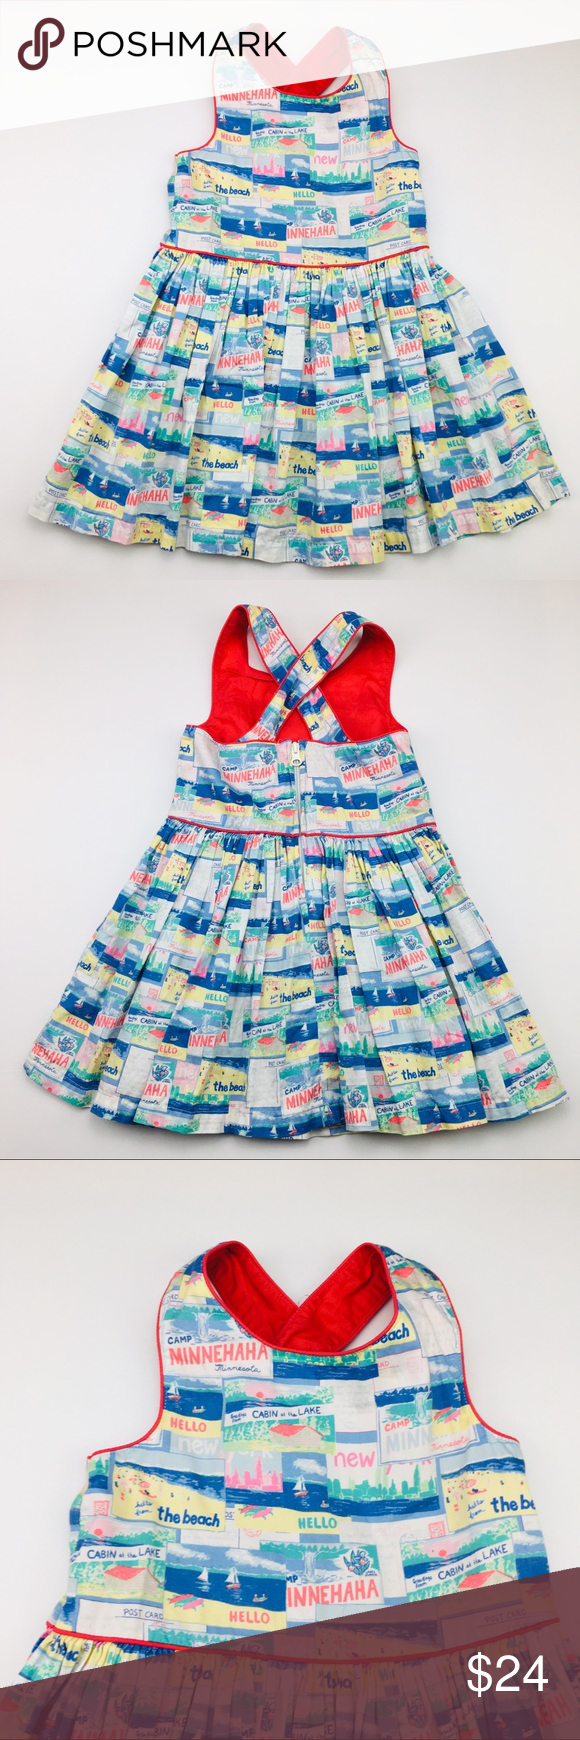 Summer Camp Postcard Retro Toddler Girl Dress 4t Toddler Girl Dresses Cotton Dress Summer Toddler Girl [ 1740 x 580 Pixel ]